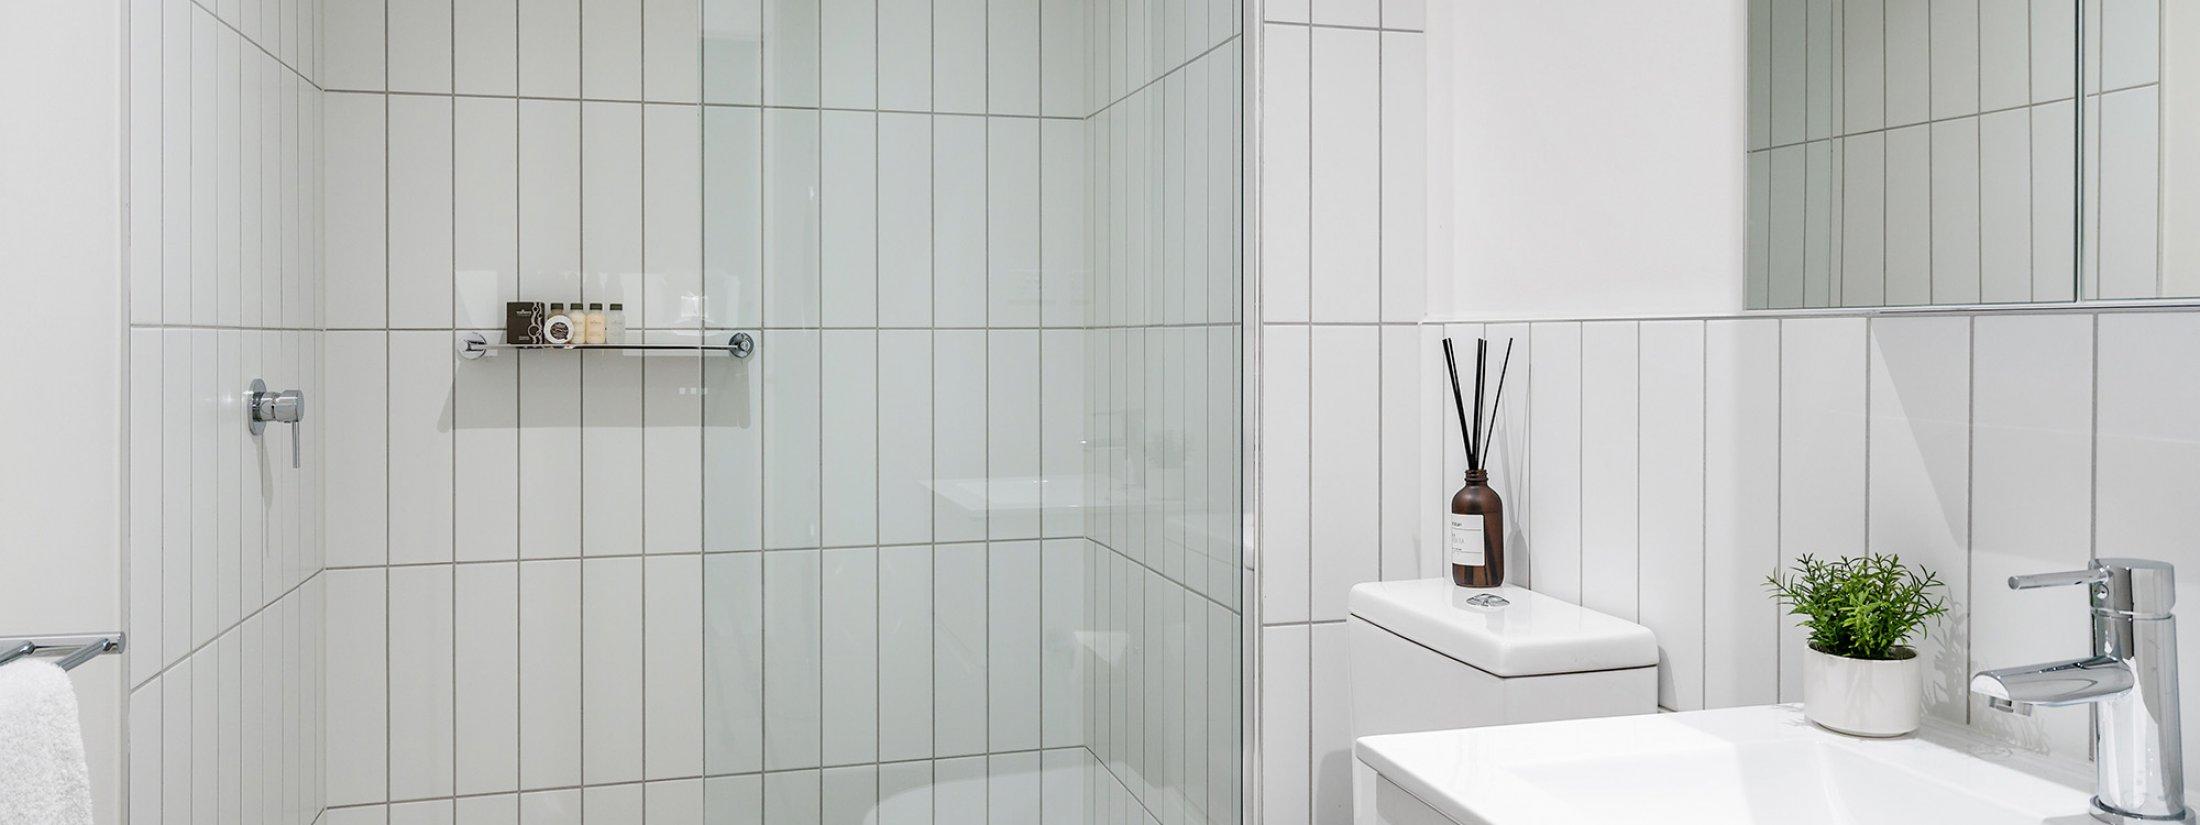 Axel Apartments 103 The Hadley - Glen Iris - Bathroom shared